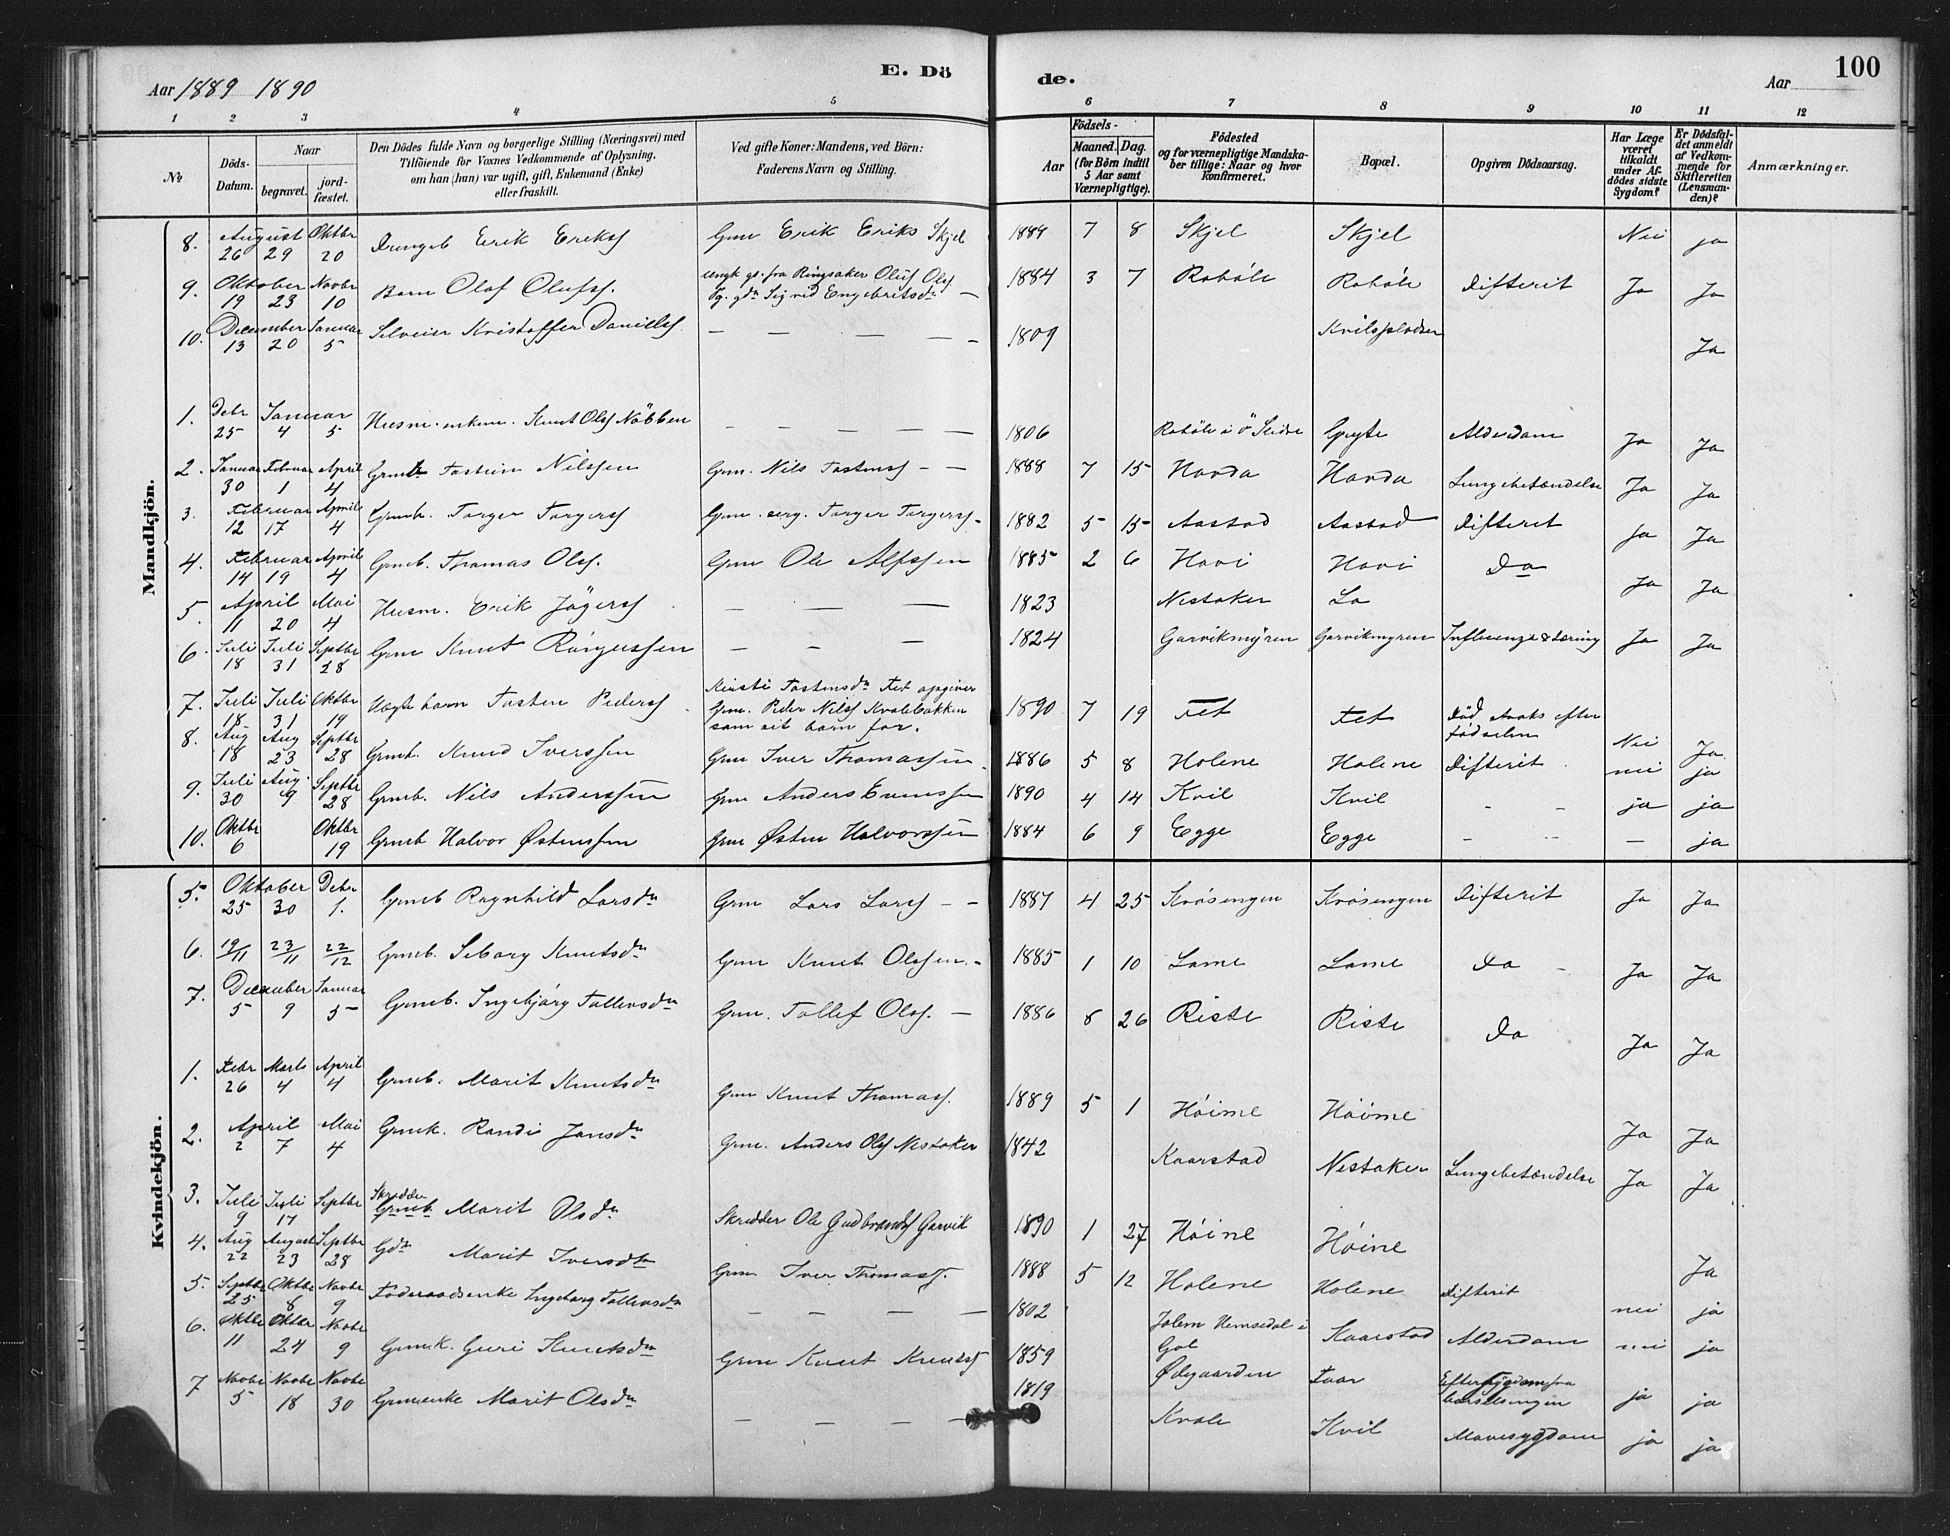 SAH, Vestre Slidre prestekontor, Klokkerbok nr. 6, 1881-1915, s. 100